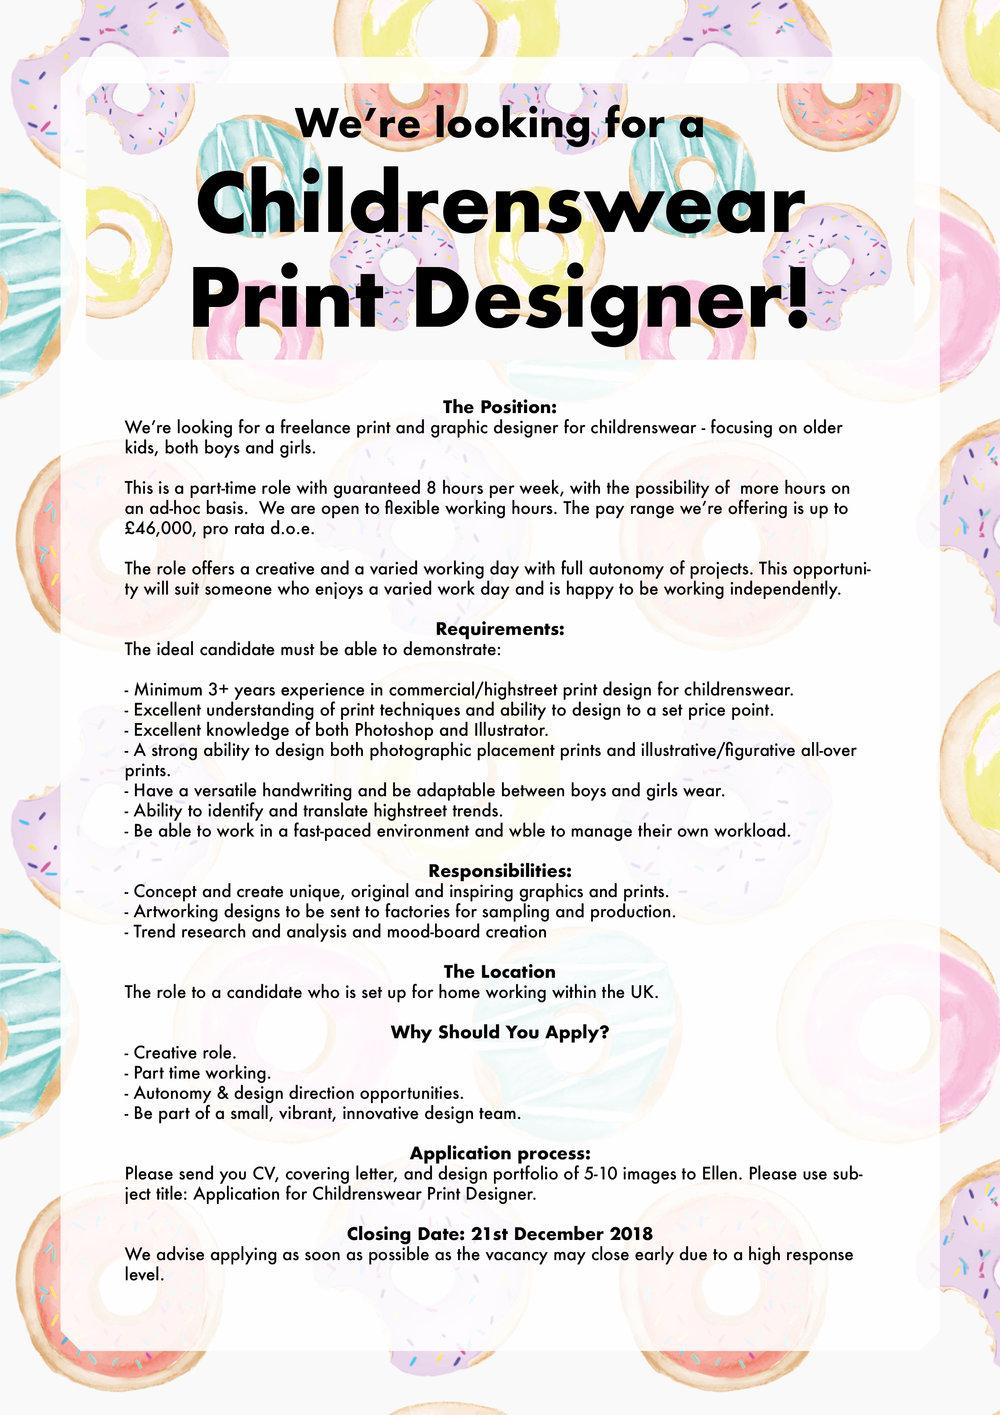 Childrenswear kidswear designer print pattern fashion freelance